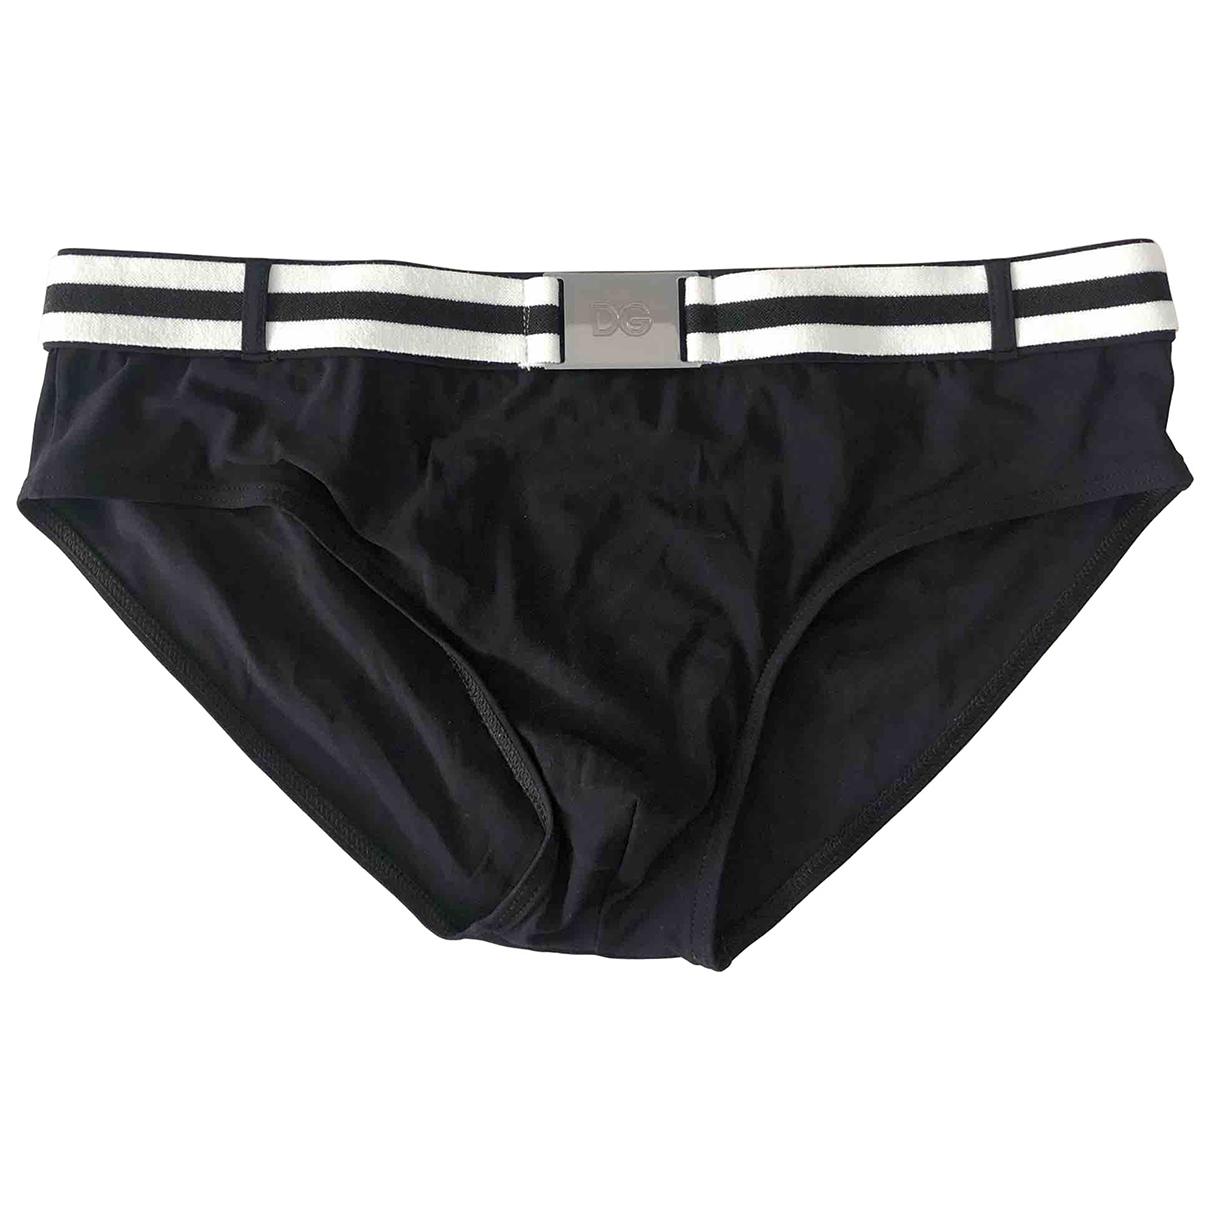 Dolce & Gabbana \N Black Cotton - elasthane Swimwear for Men 48 IT